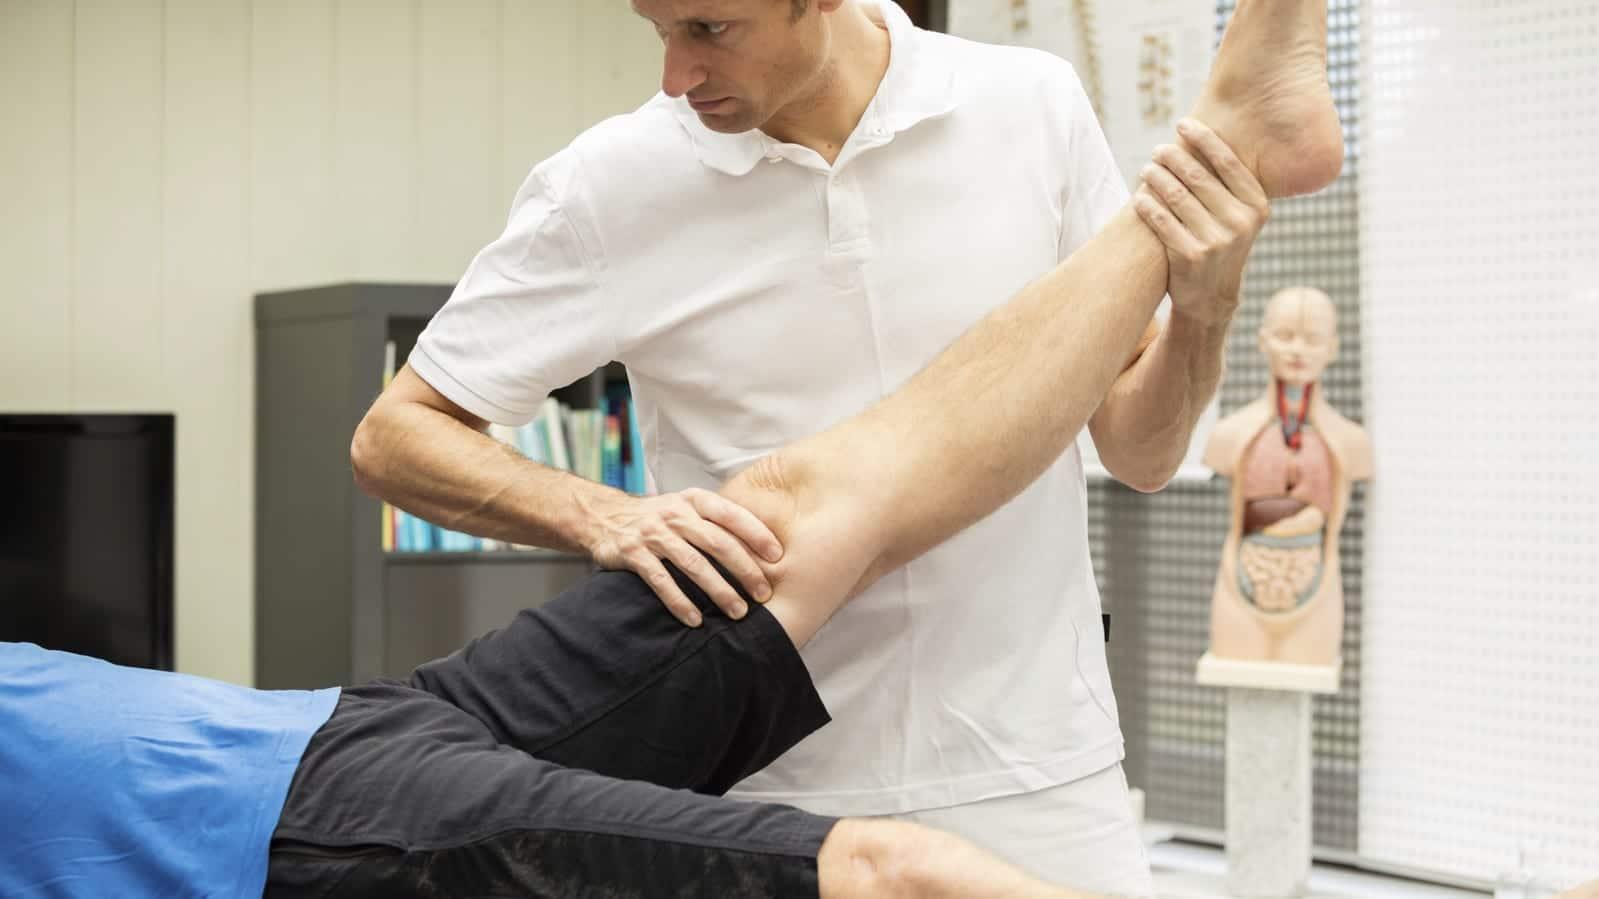 Injured Man Having Leg Examined Stock Photo